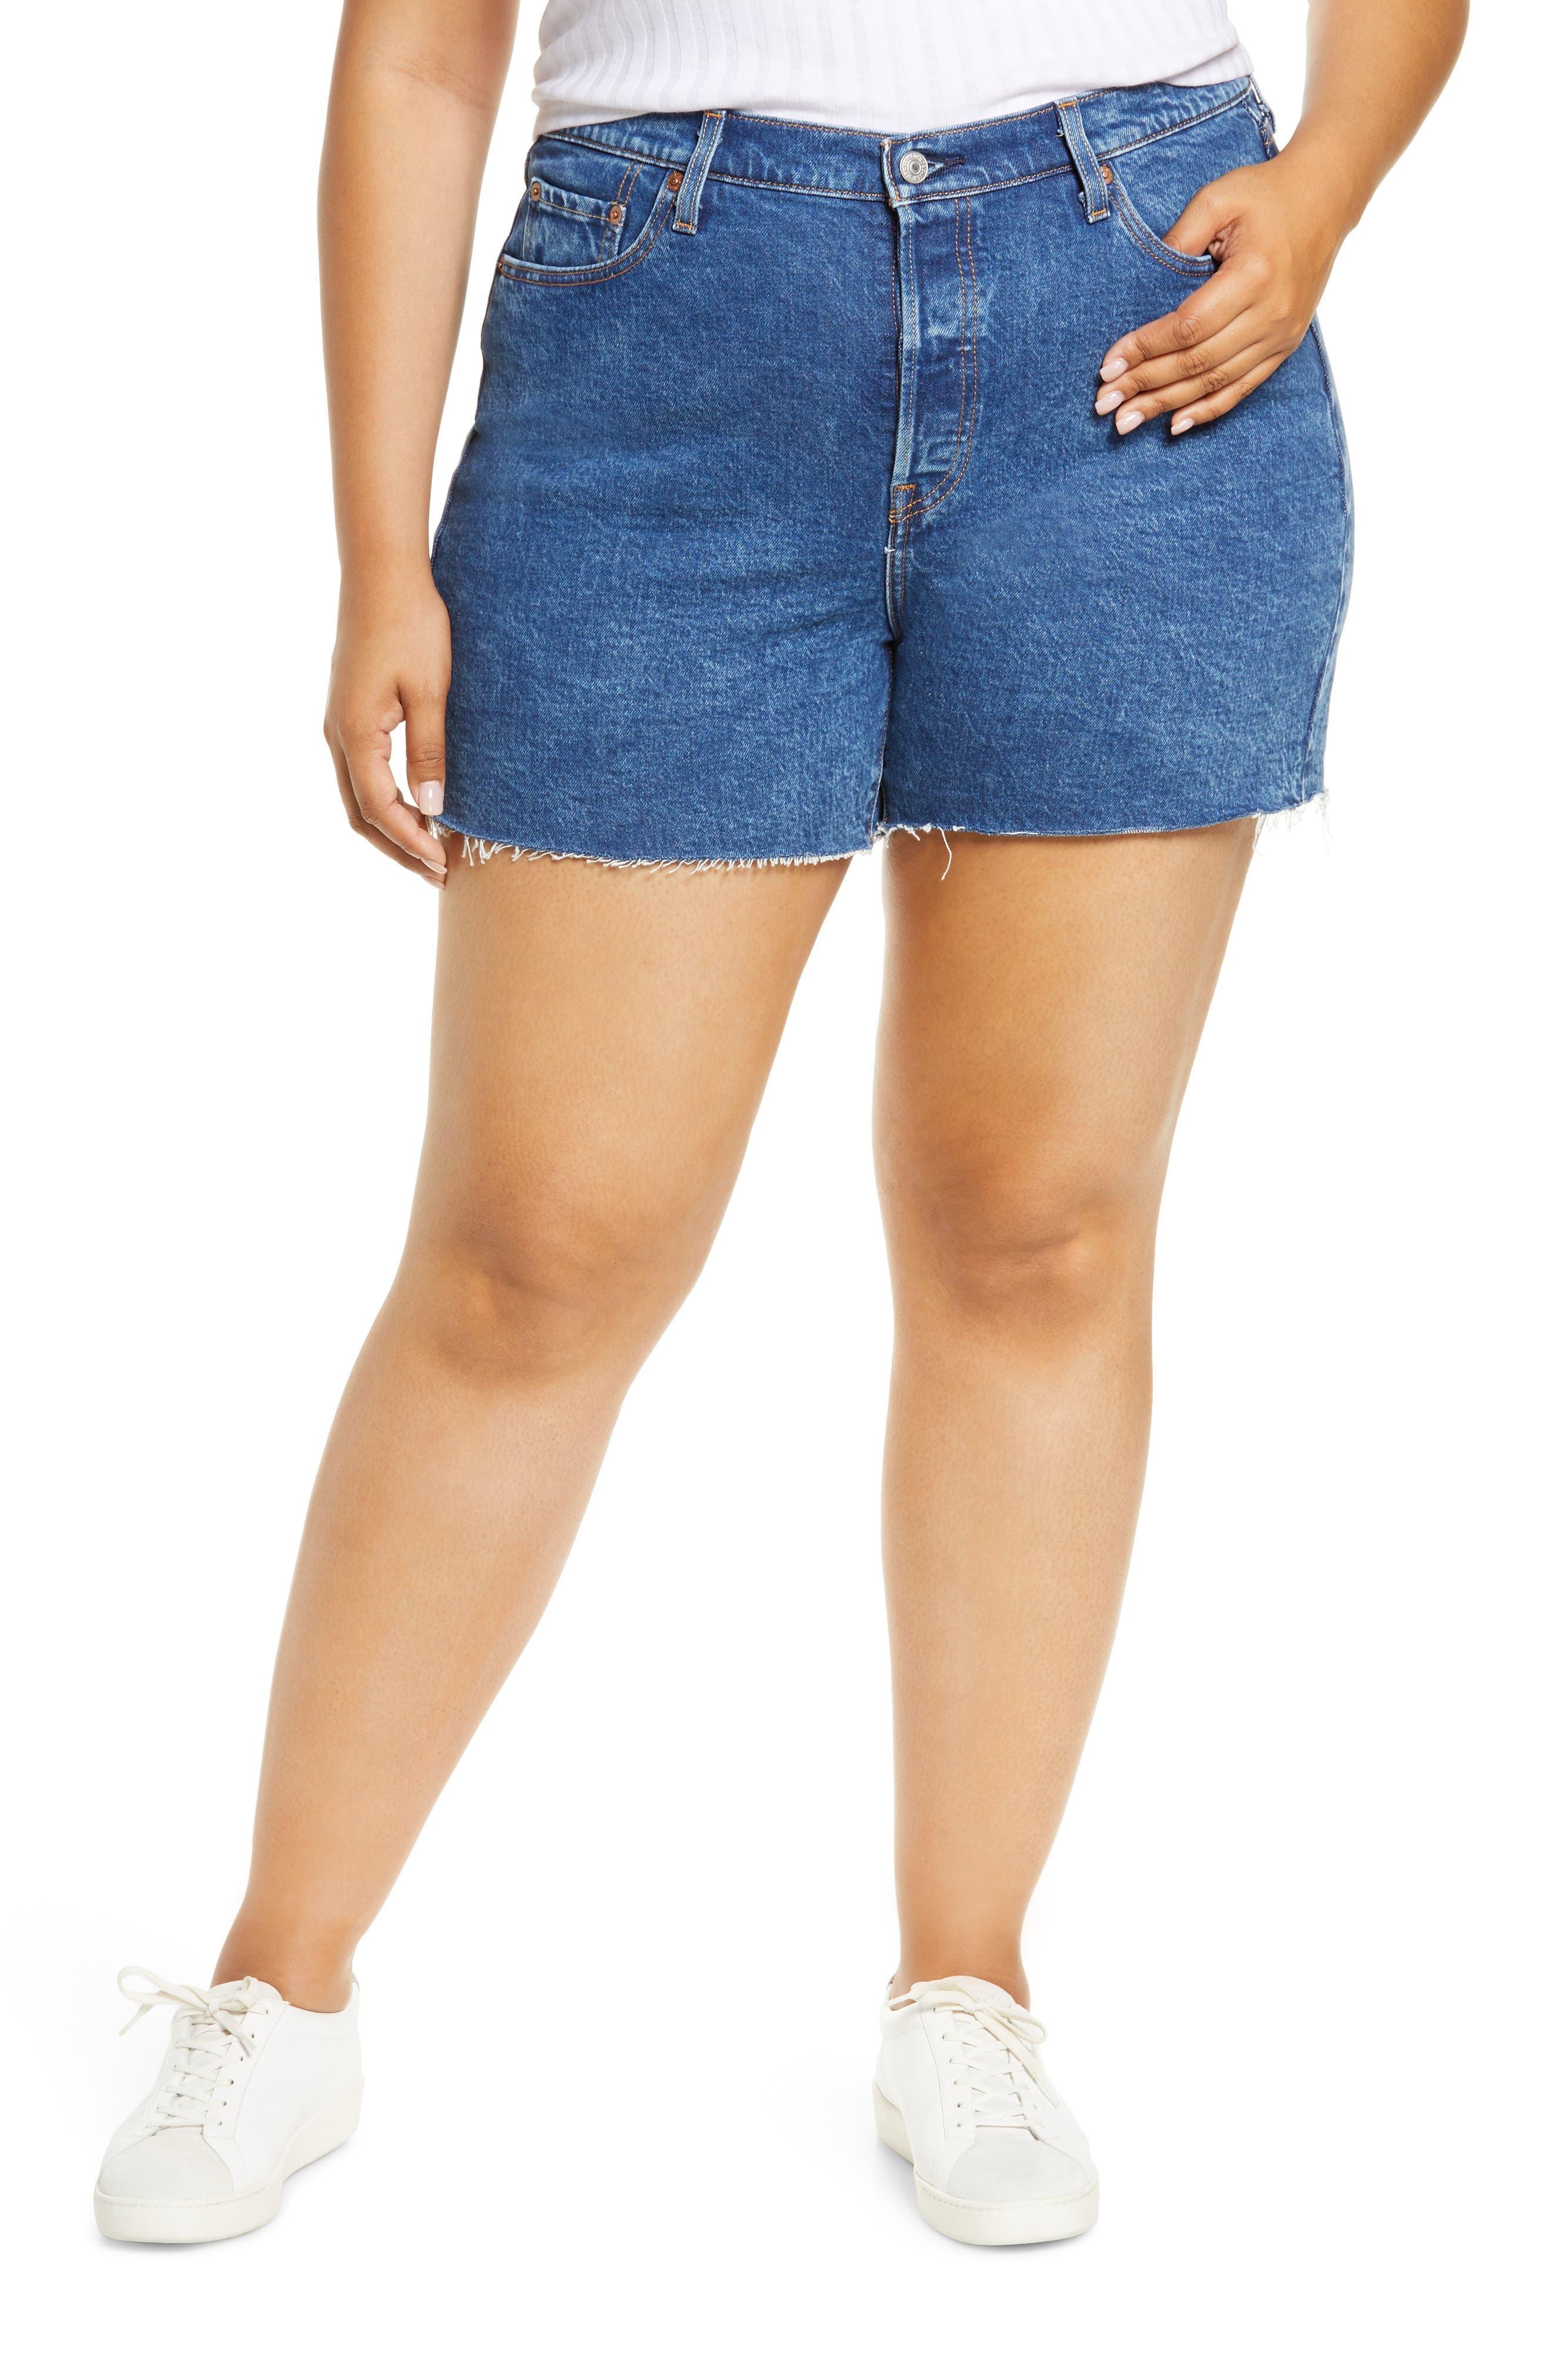 Plus Women's Levi's 501 Original Raw Hem Denim Shorts